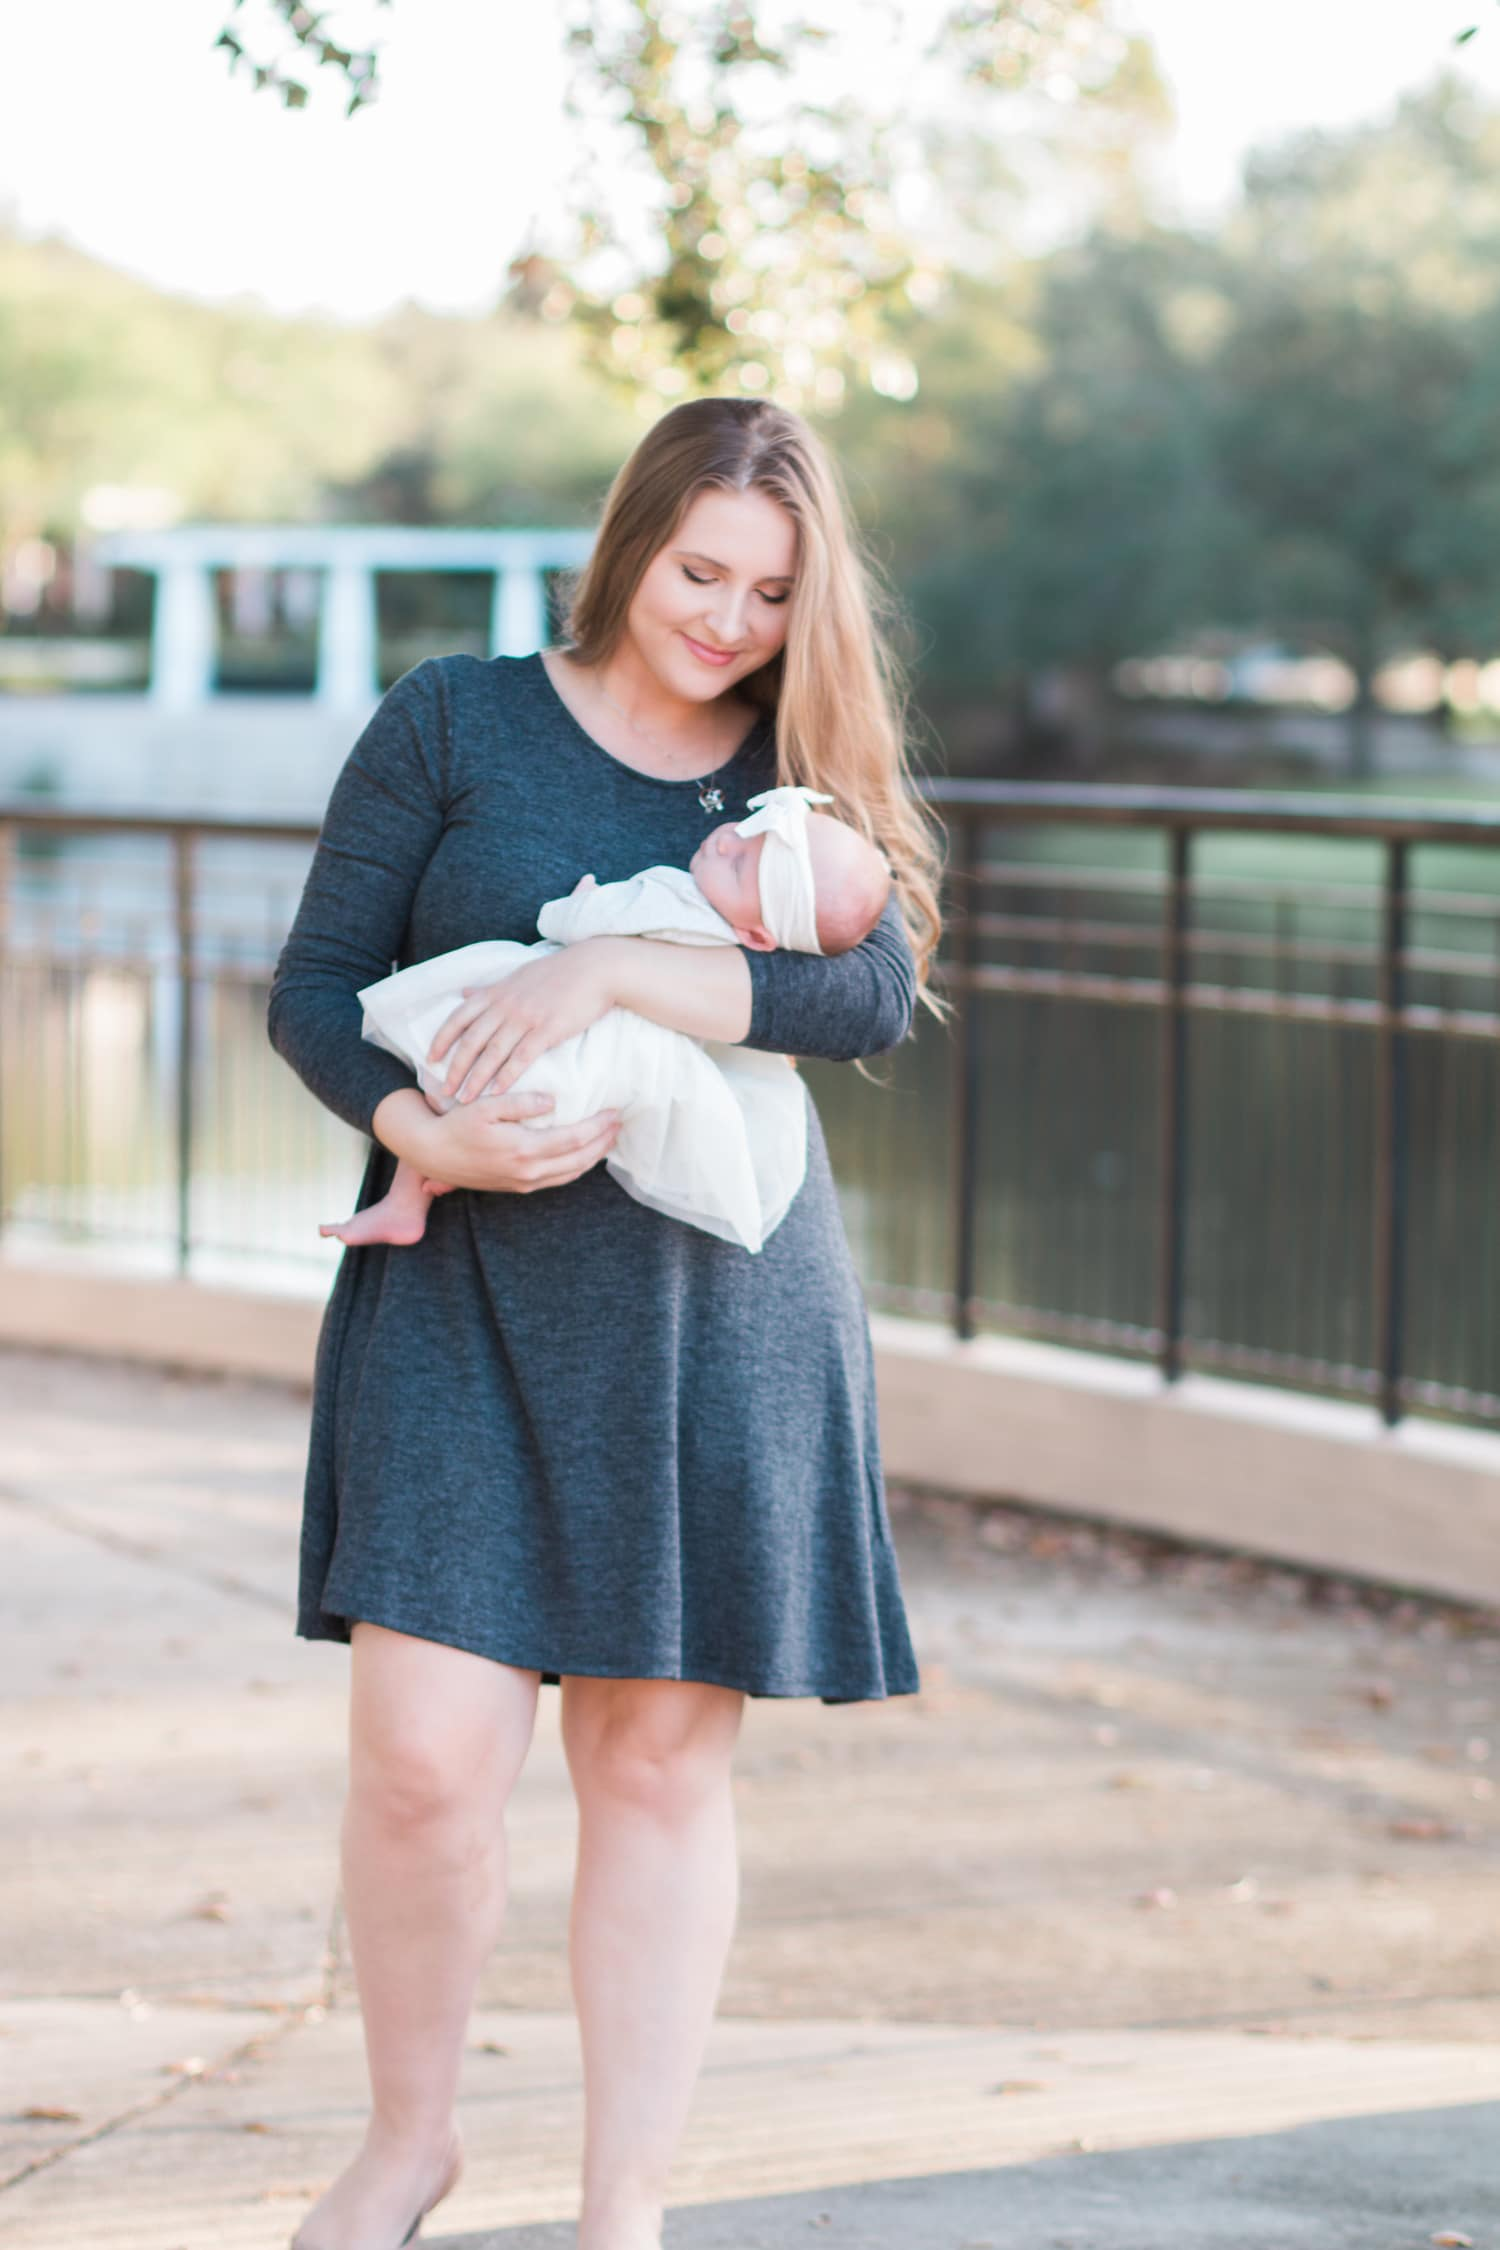 new mom becoming a mother newborn baby Ashley Brooke Nicholas blogger | Viactiv